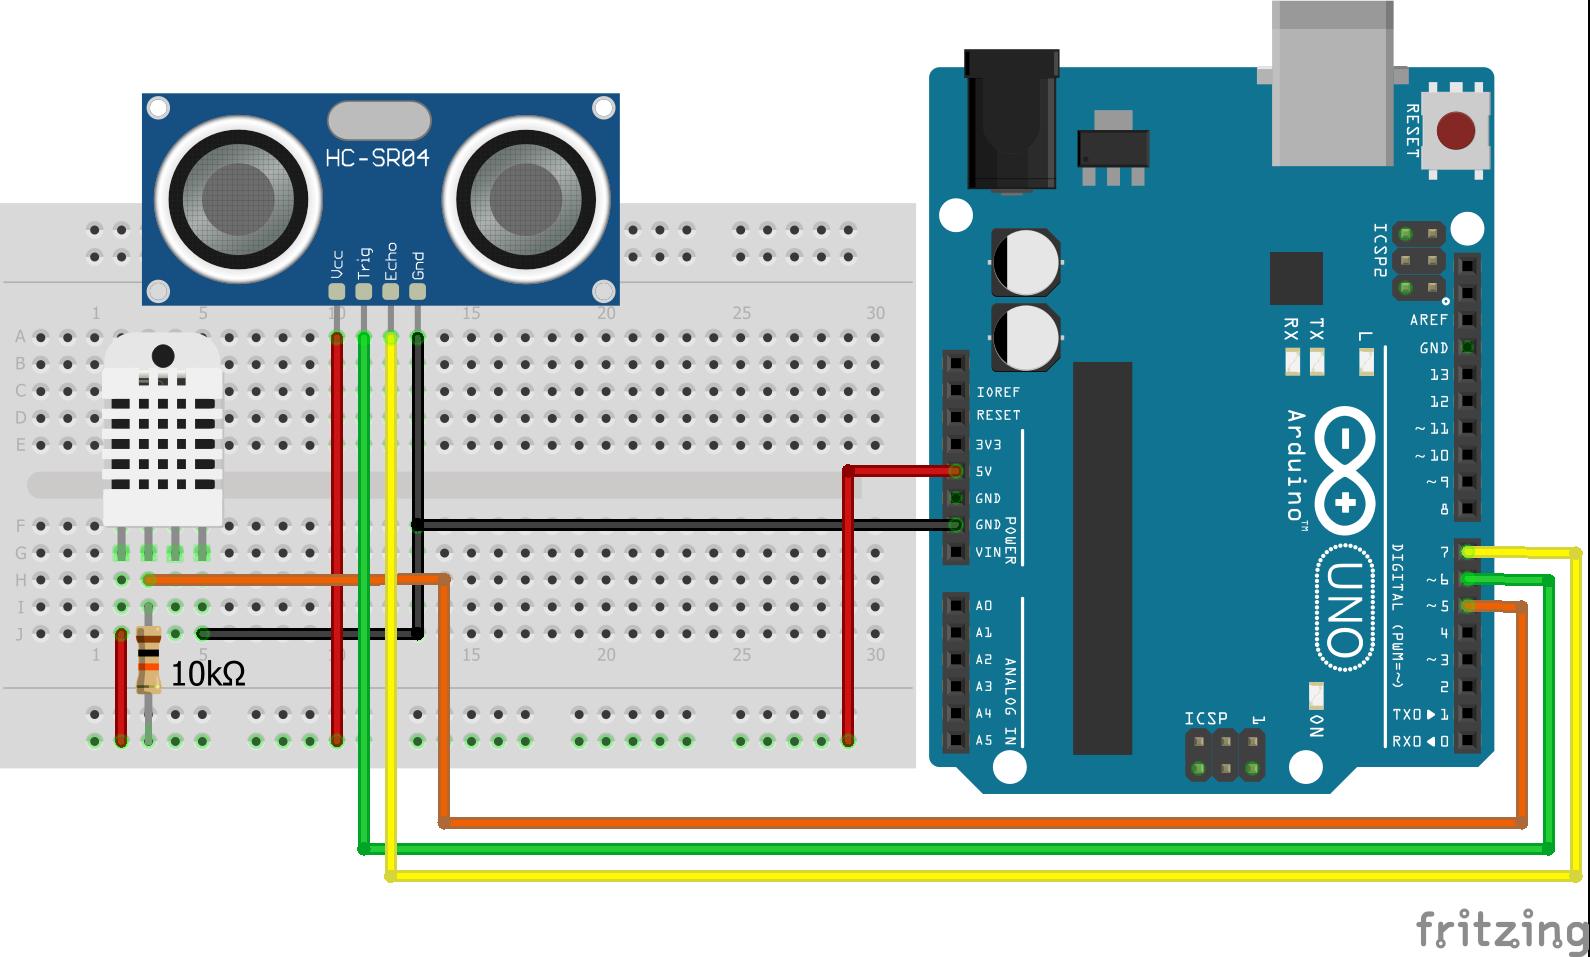 Wiring HC-SR04 Ultrasonic Distance Sensor DHT22 Arduino Uno